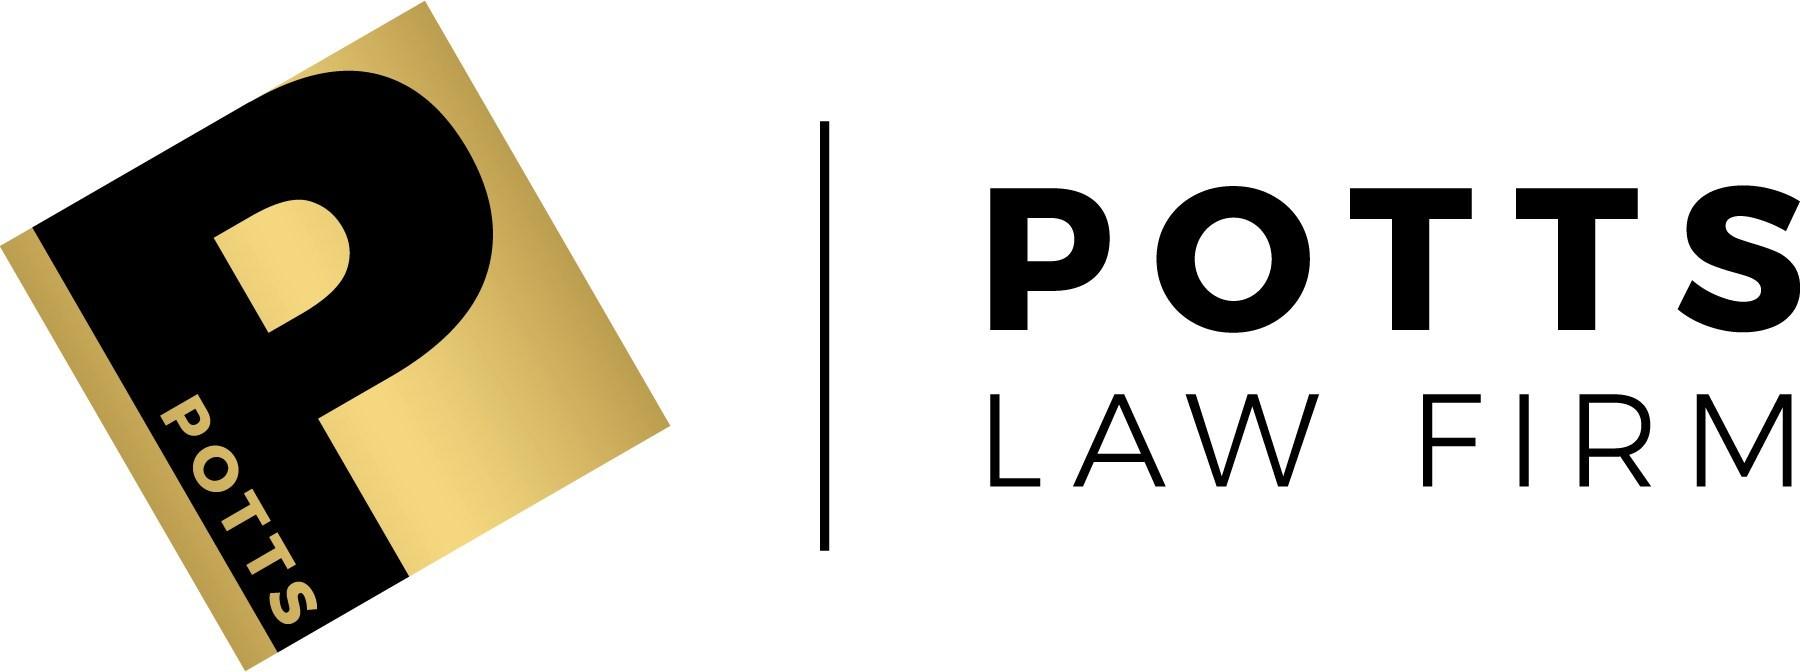 The Potts Law Firm logo (PRNewsfoto/The Potts Law Firm, LLP)